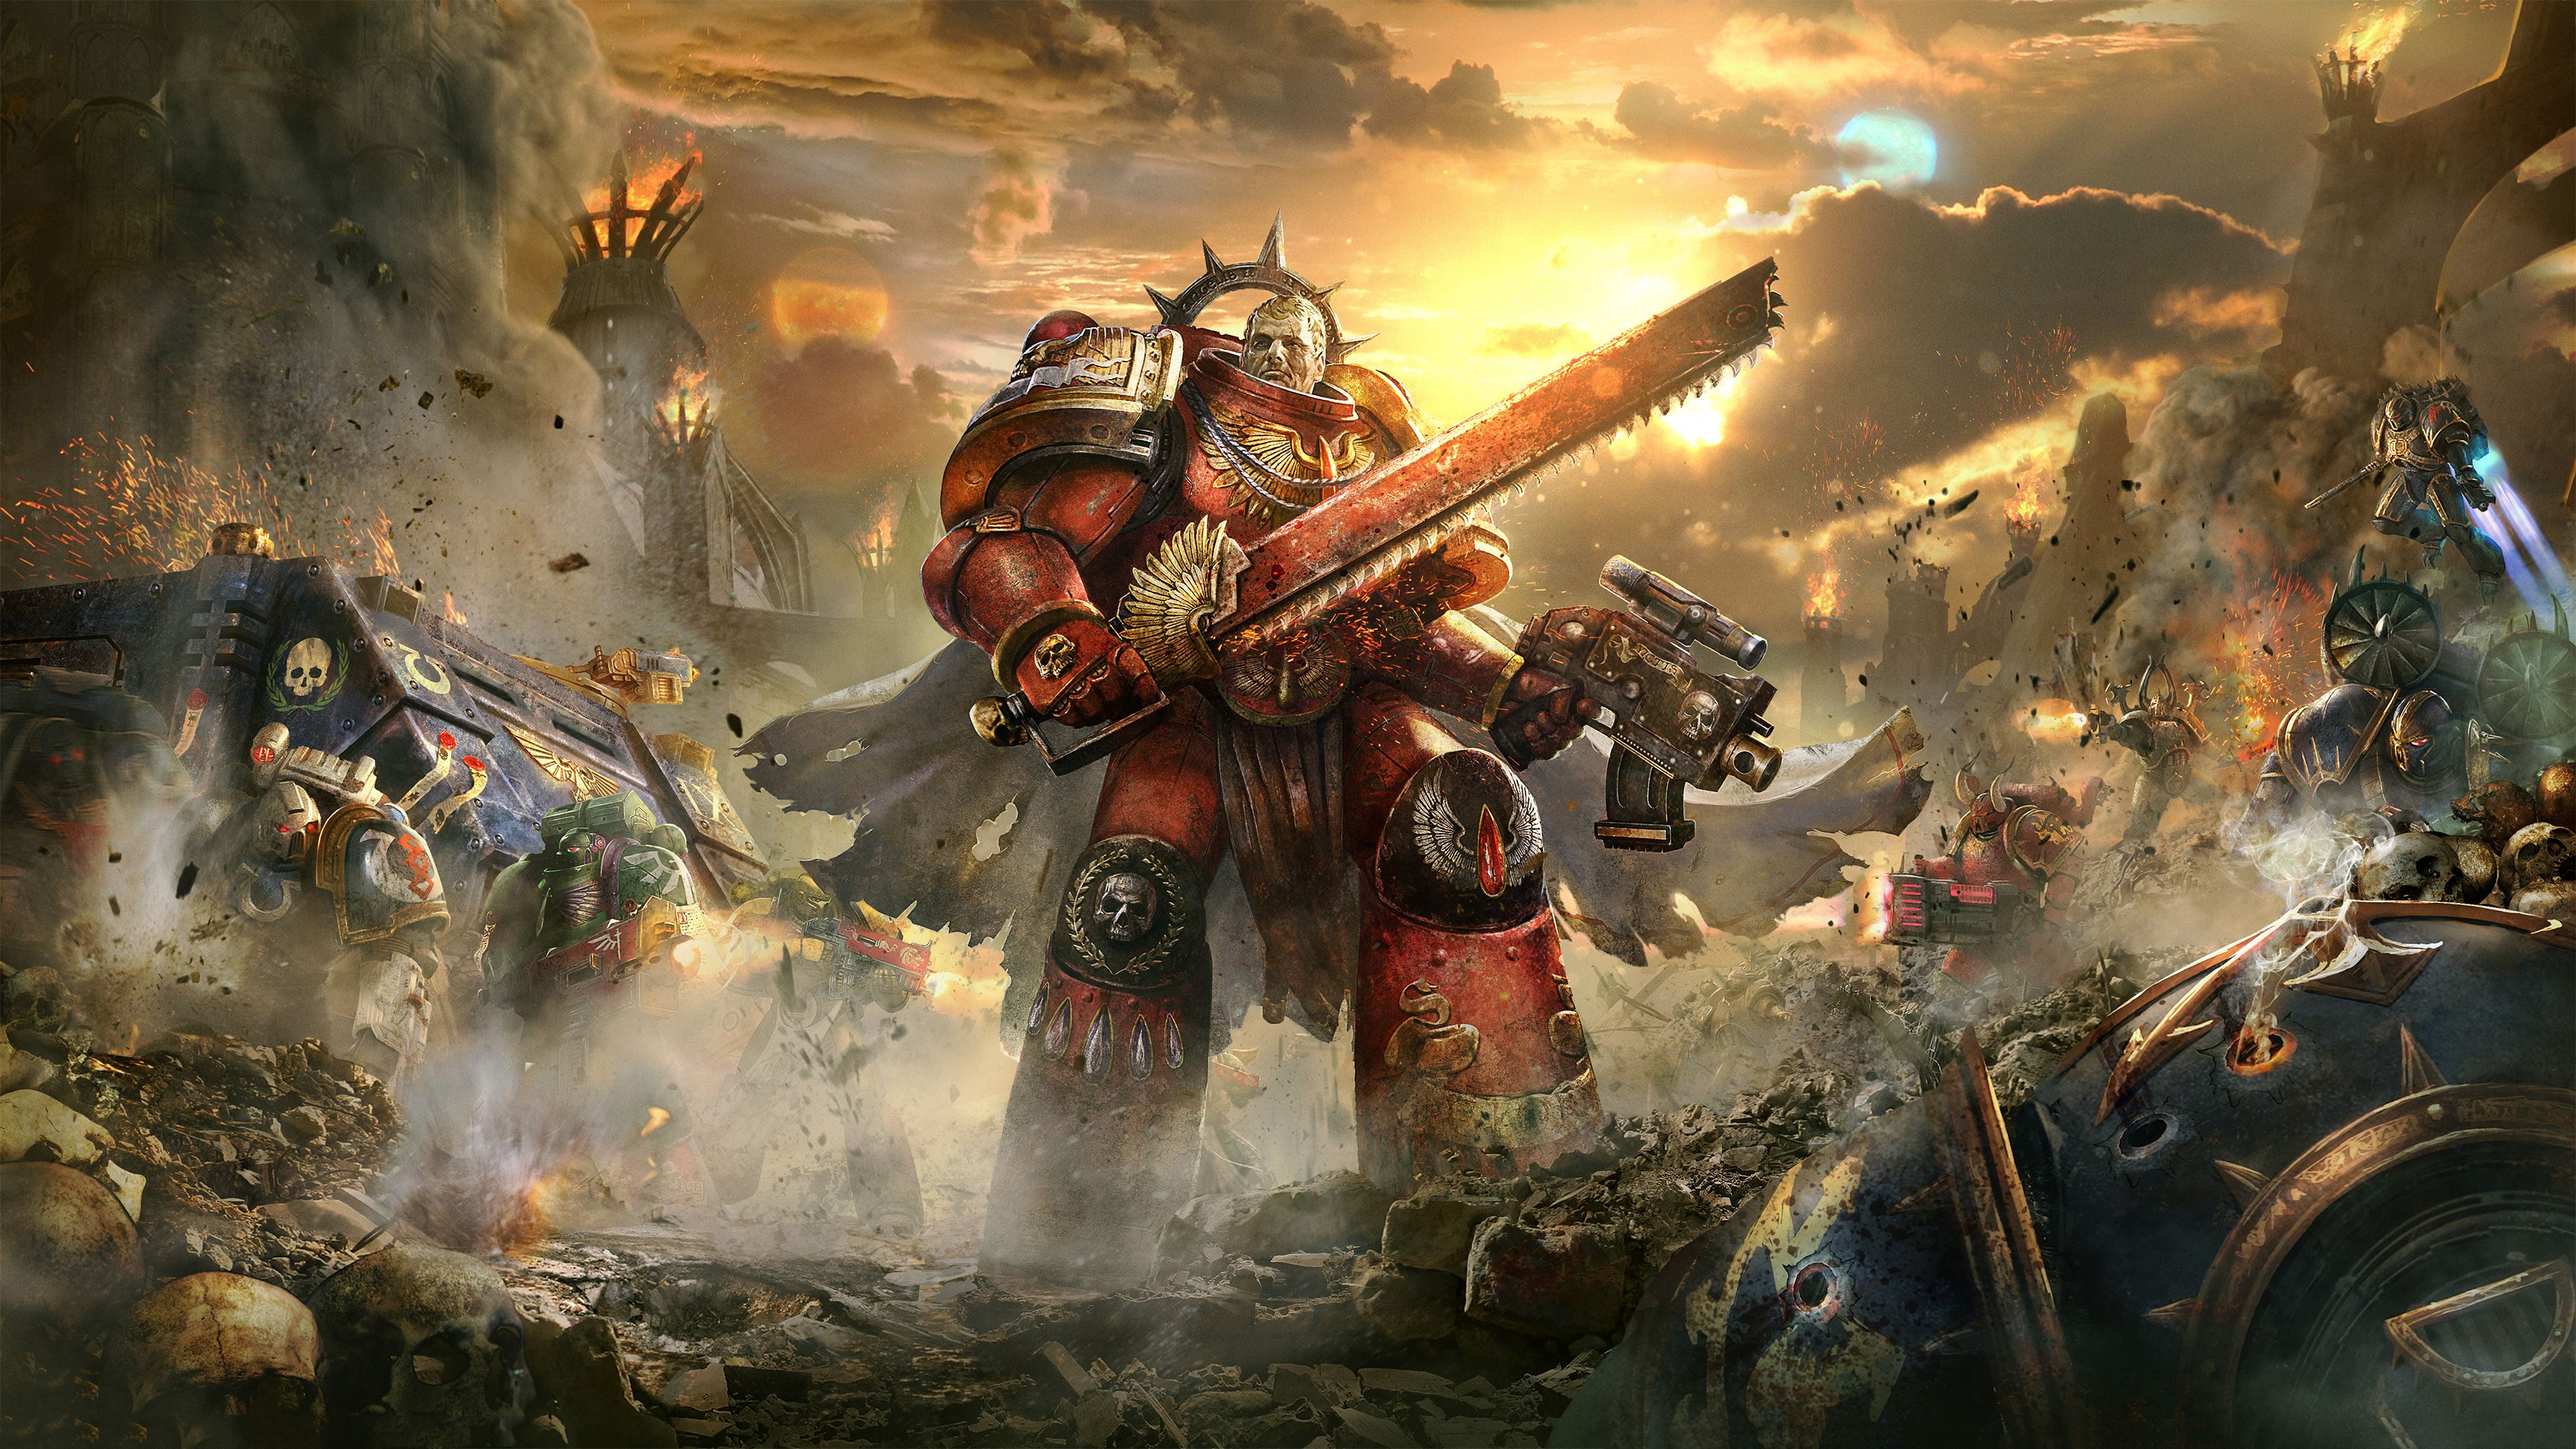 Warhammer 40000 Hd Games 4k Wallpaper Images Data Src Warhammer 40k Wallpaper 4k 3093754 Hd Wallpaper Backgrounds Download